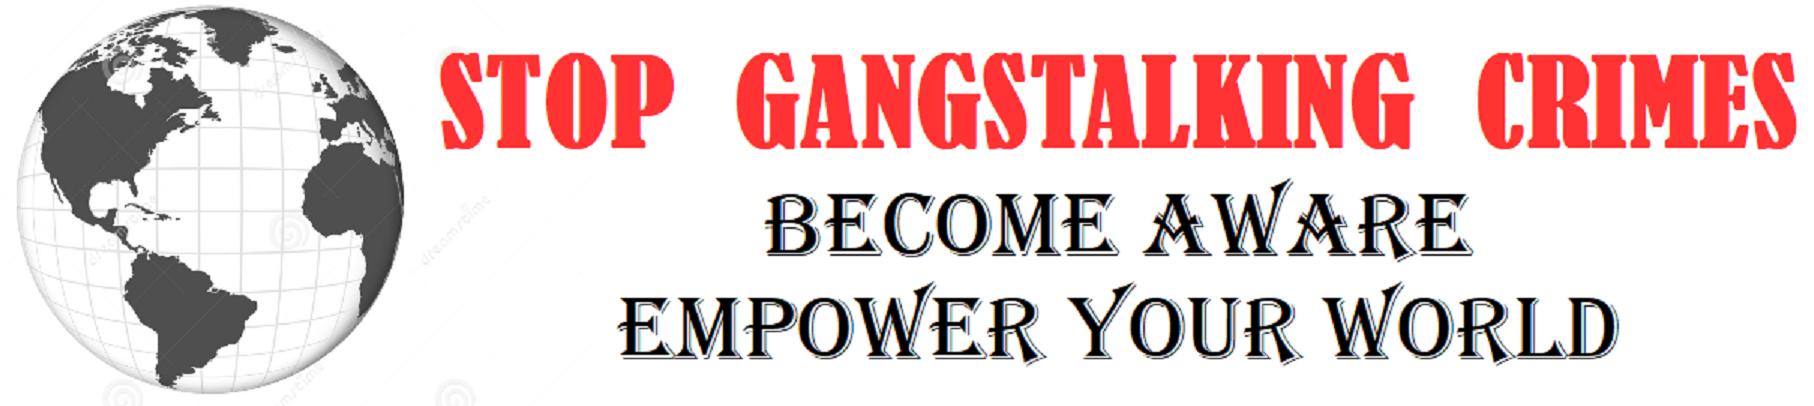 Stop Gangstalking Crimes Targeted Individuals